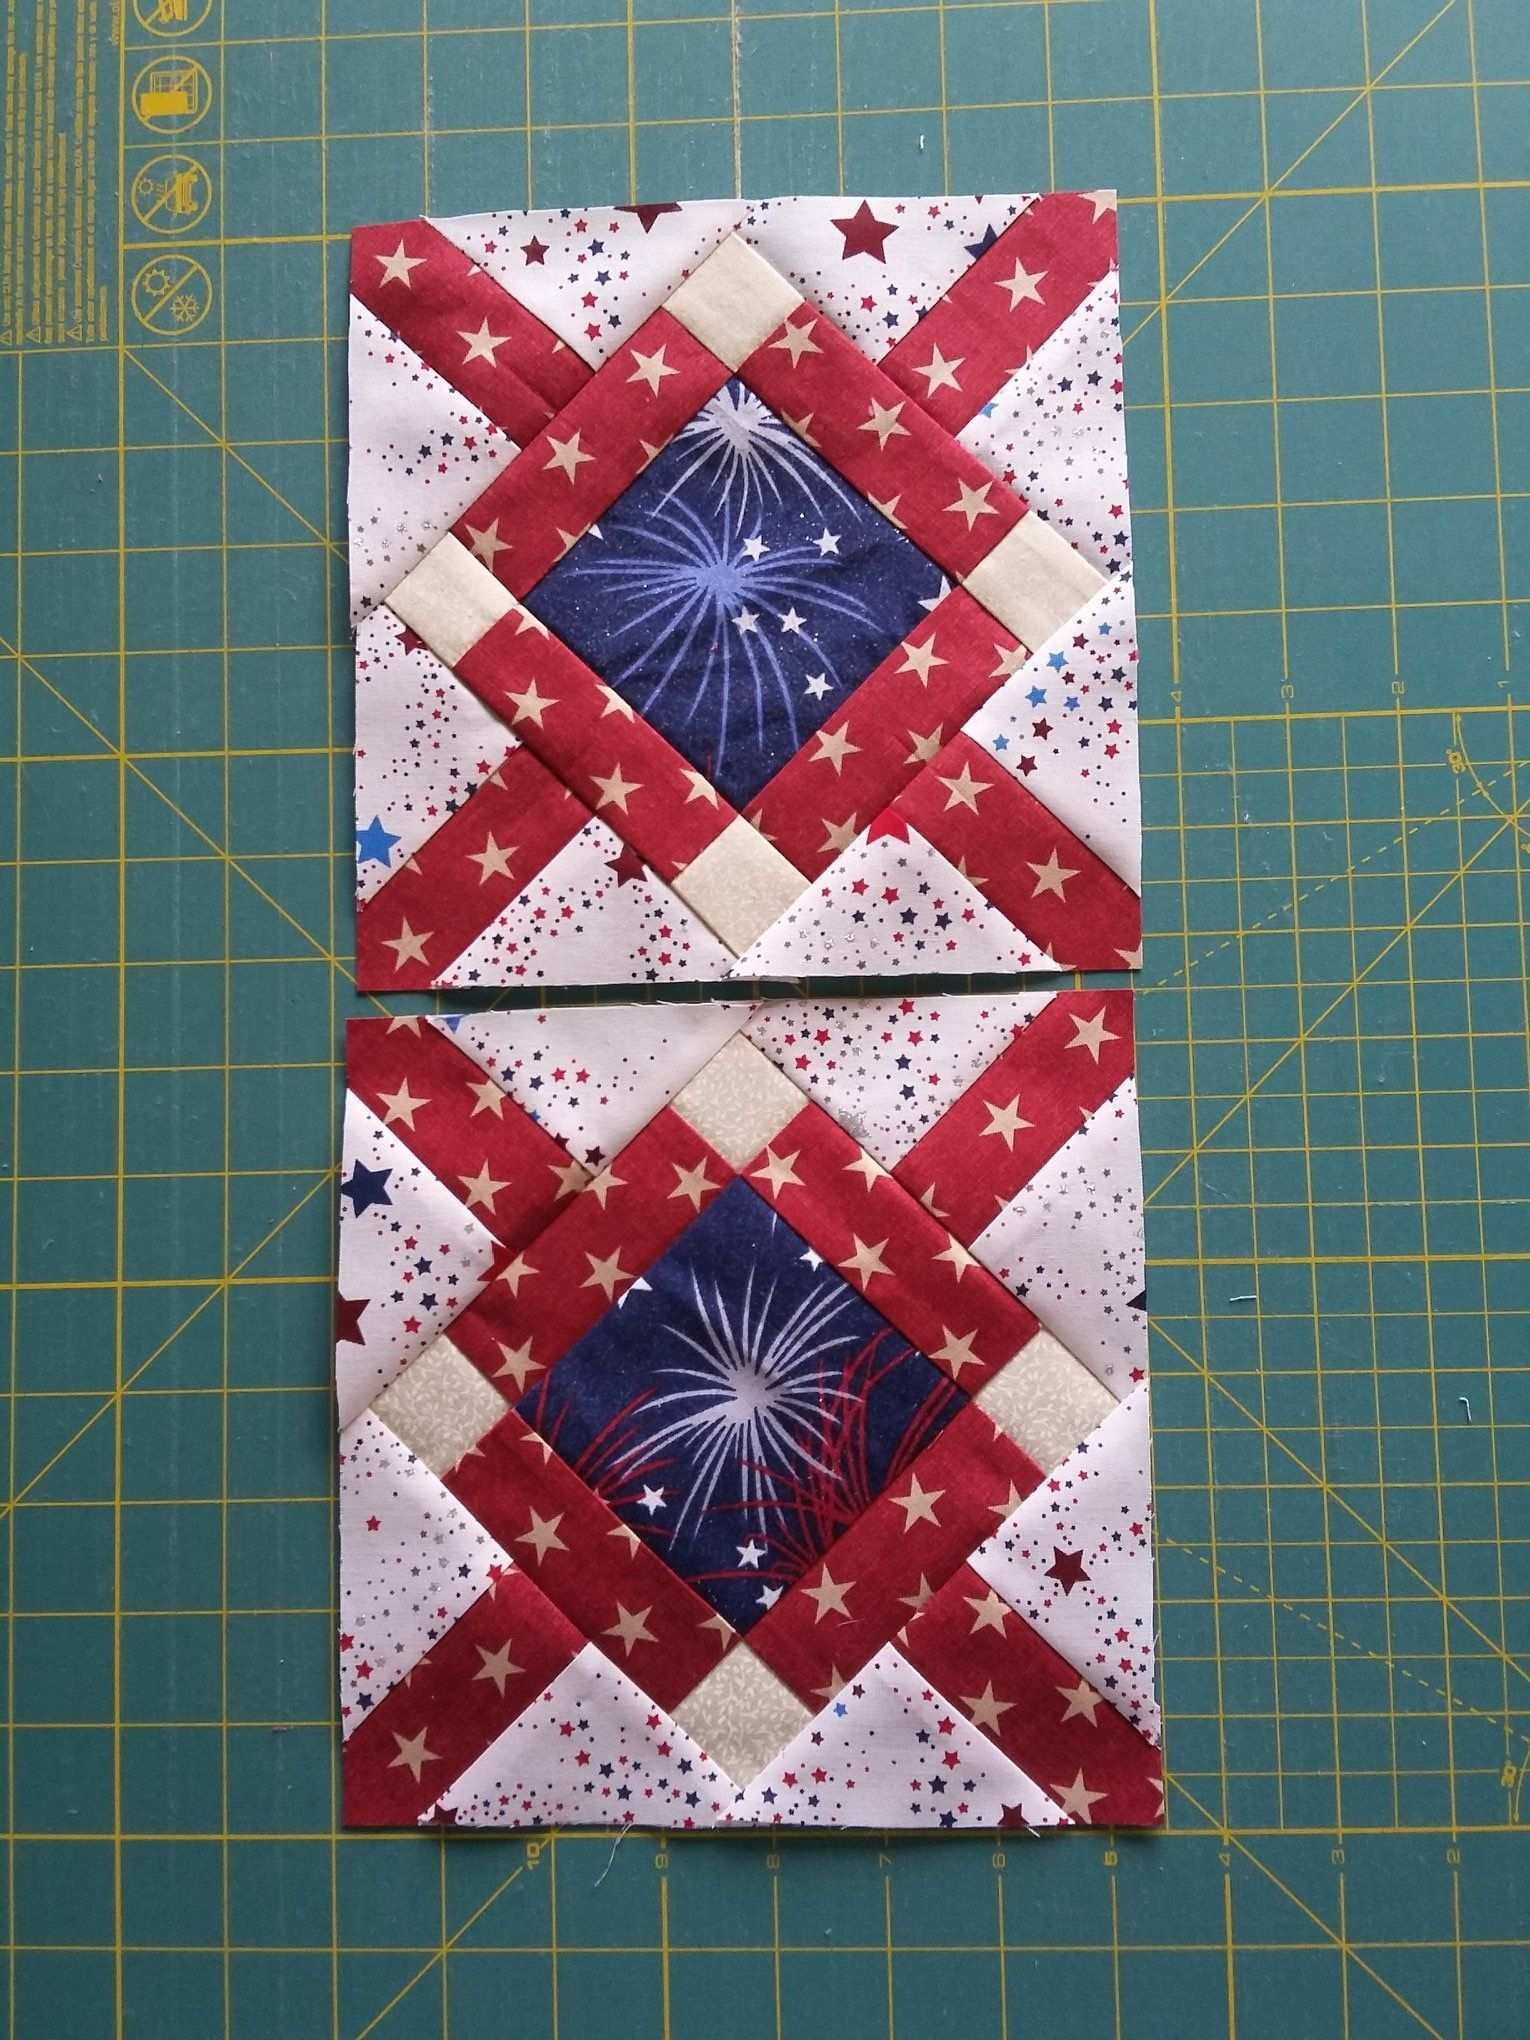 Pin By Gretl On Quilt Blocks Quilt Patterns Patriotic Quilts Quilt Blocks